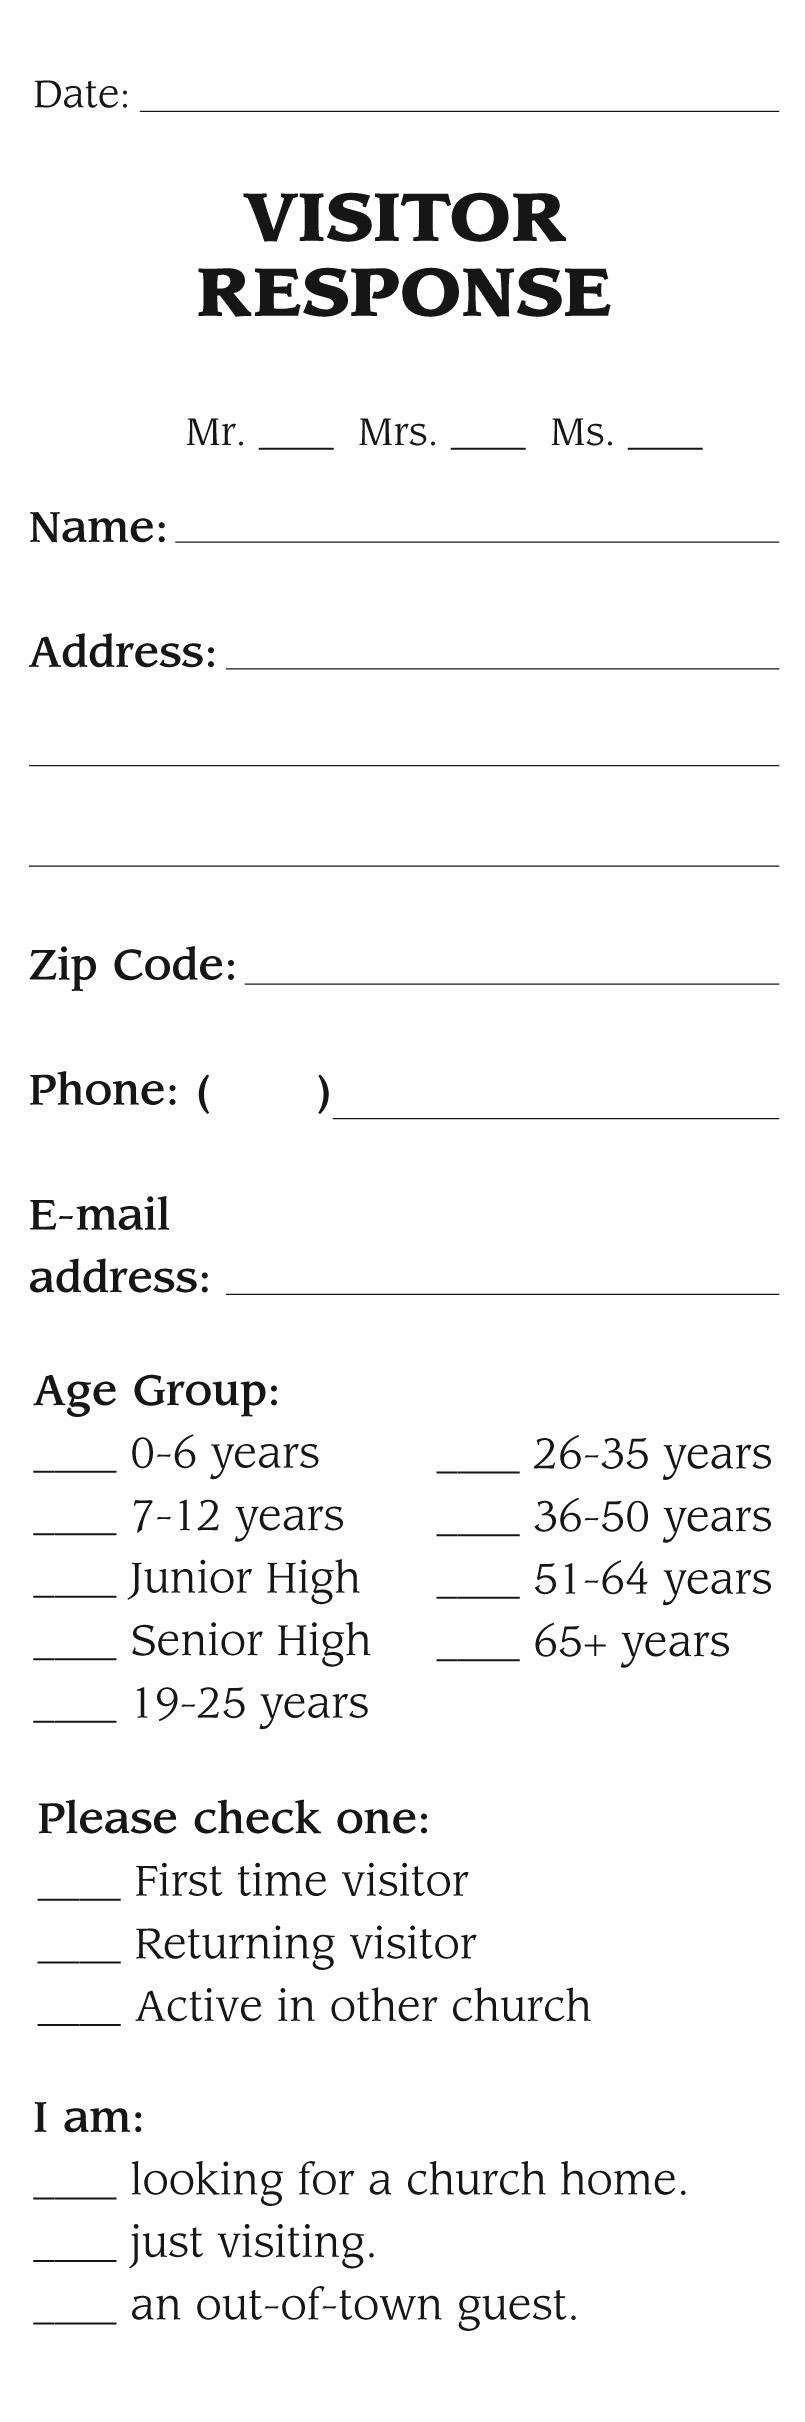 Visitor Response Tab Jpg 805 2422 Mail Template Program Template Templates